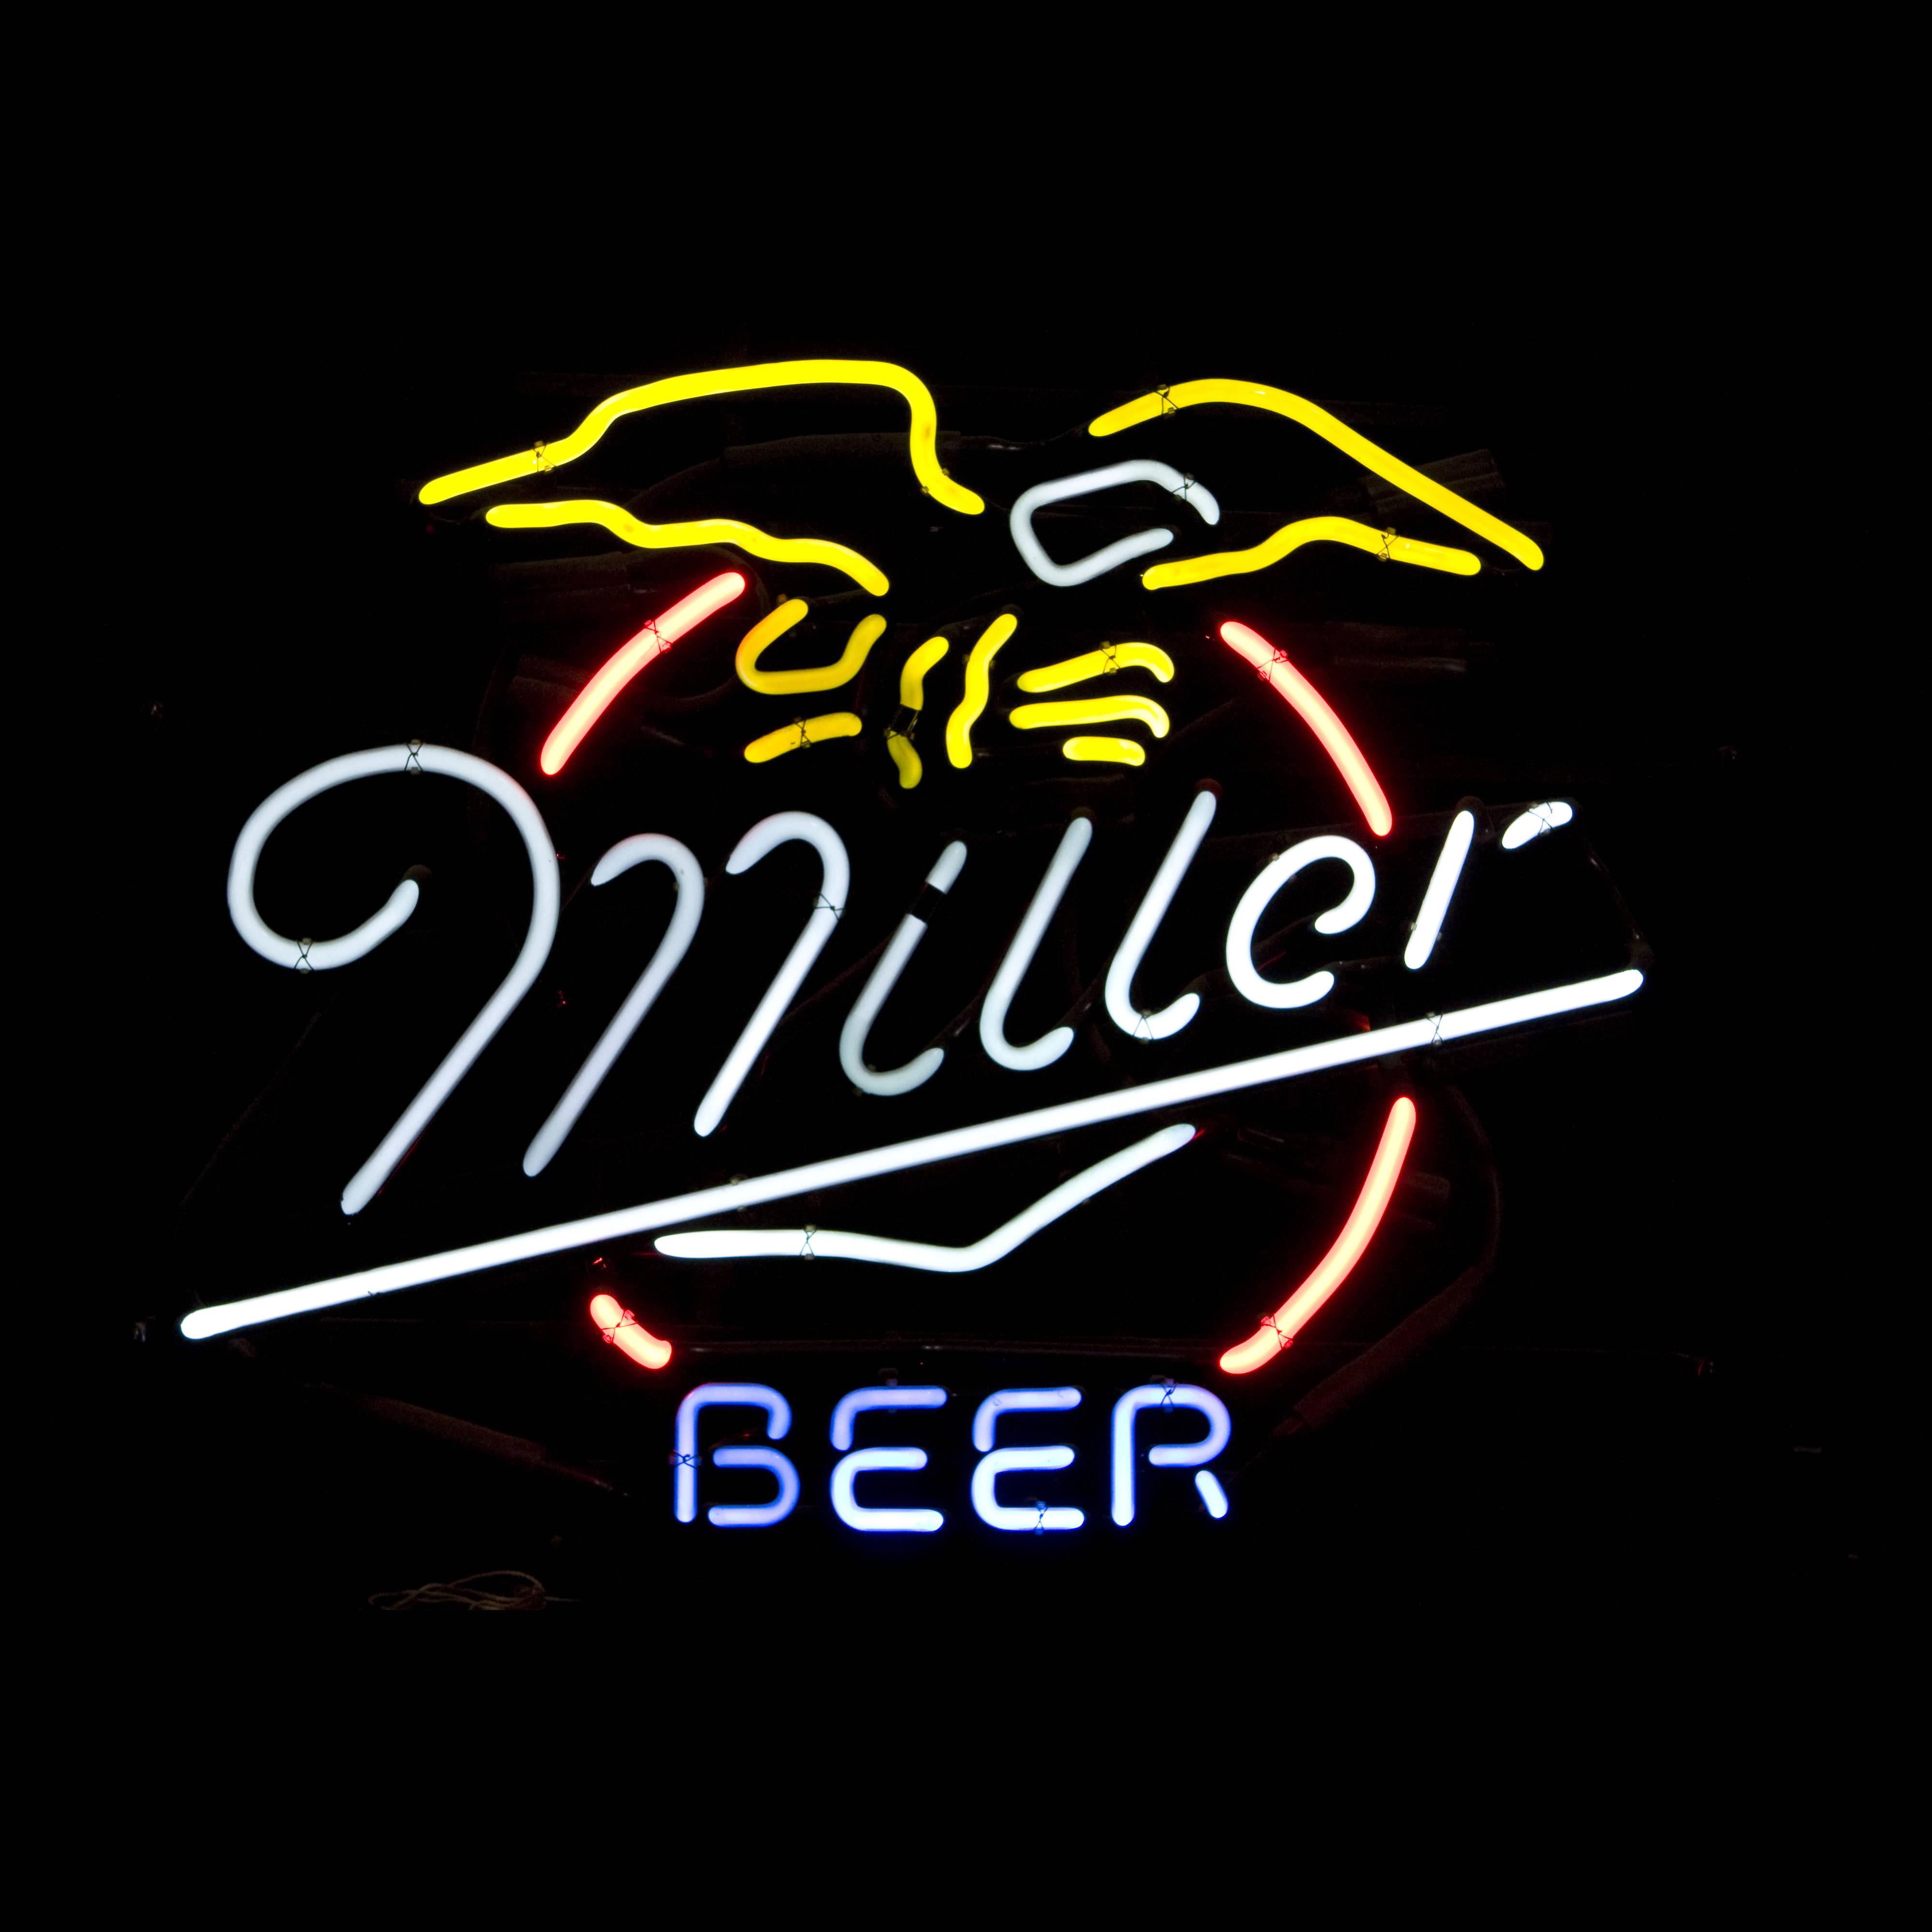 MILLER BEER / NEON SIGN | Air Designs